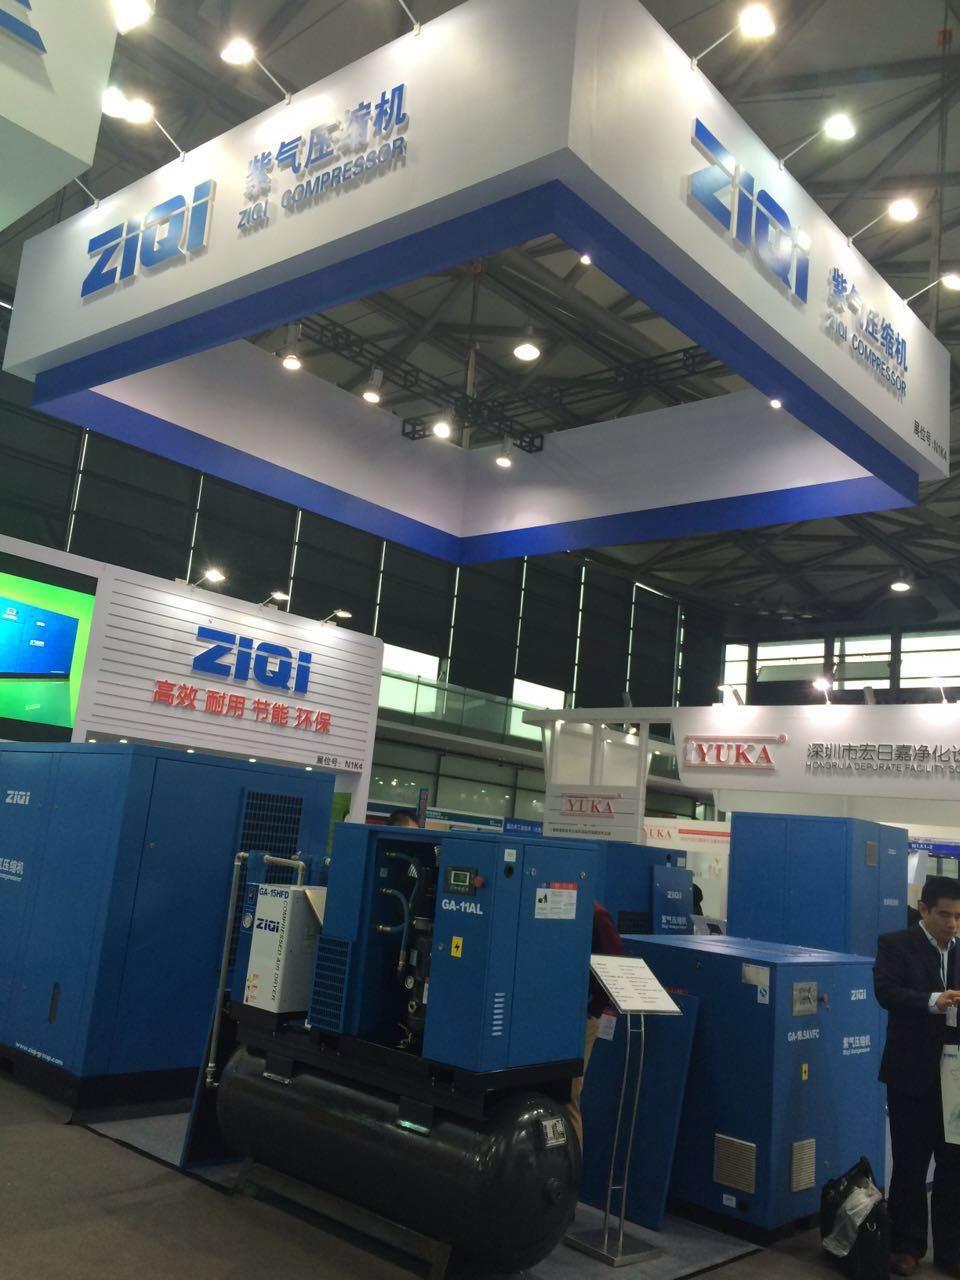 PTC Comvac Asia Shanghai exhibition